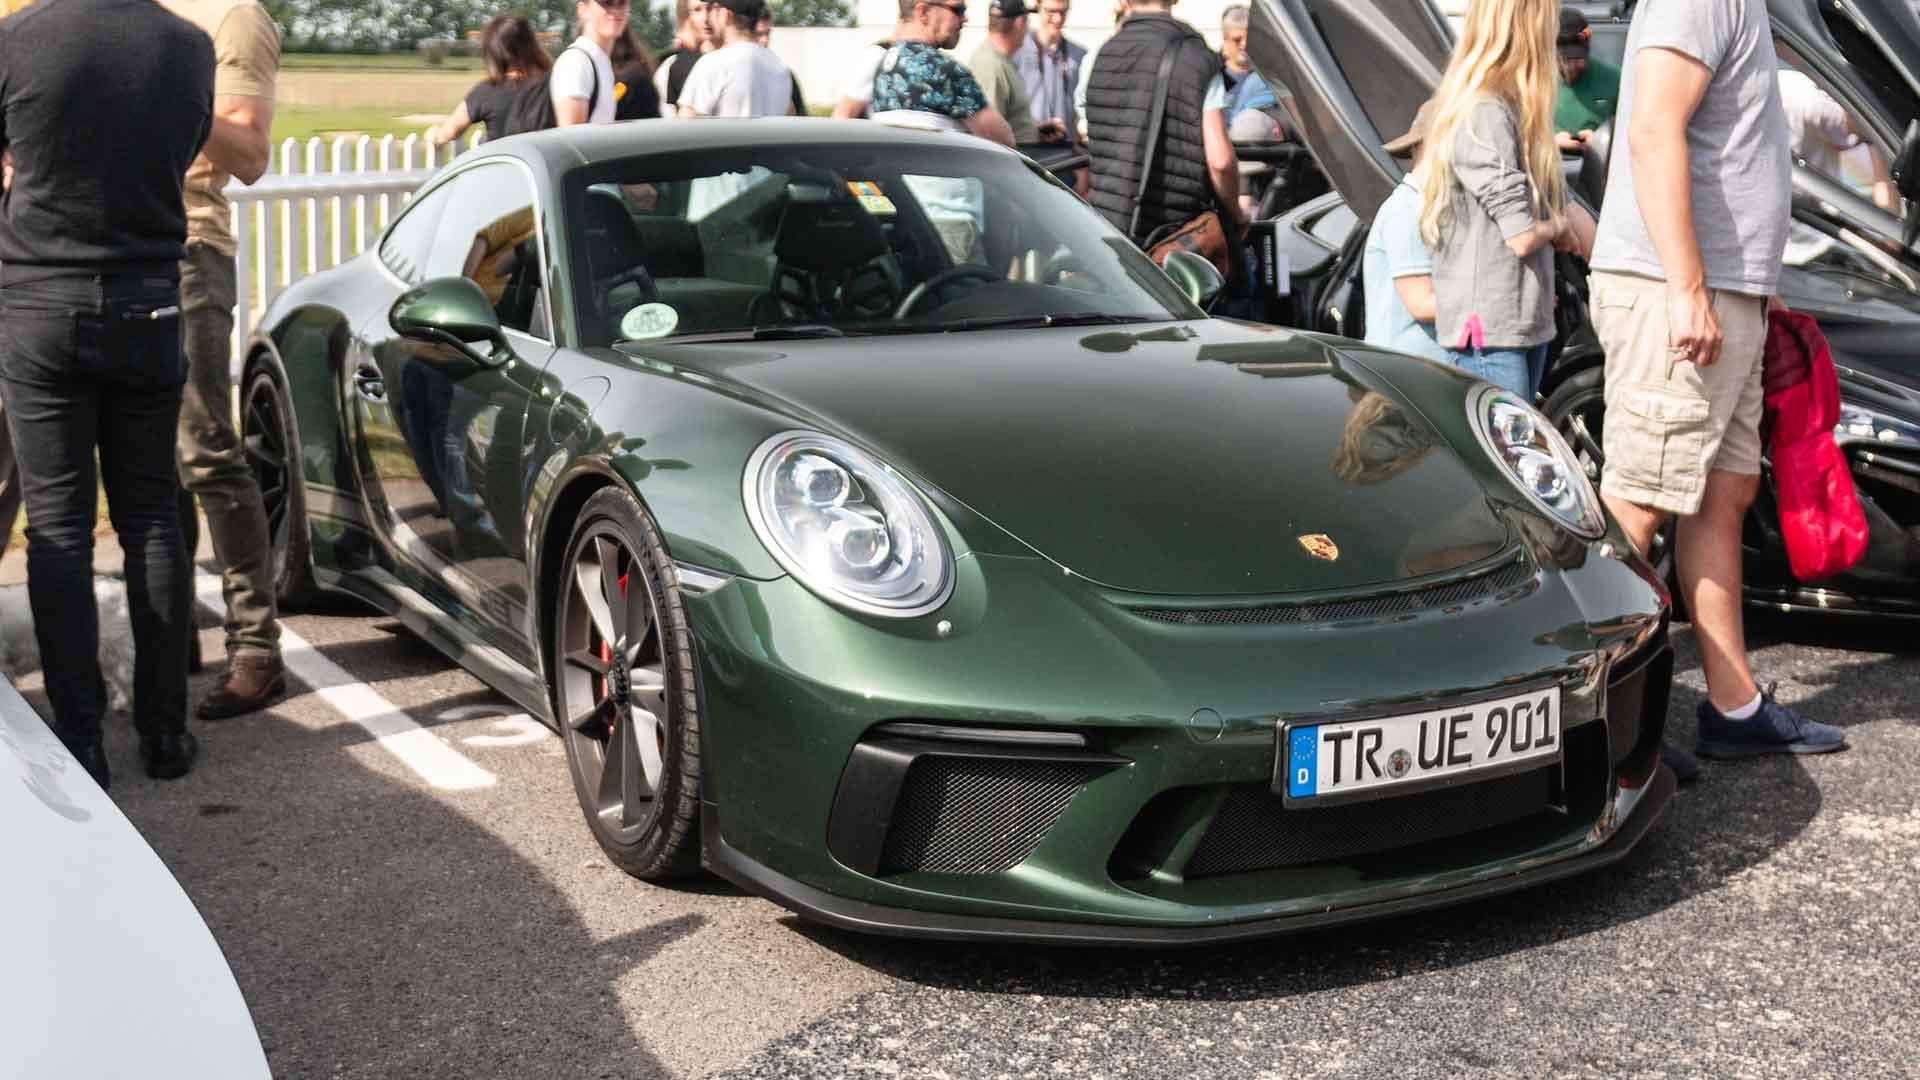 Porsche 911 GT3 Touring at Goodwood Supercar Sunday